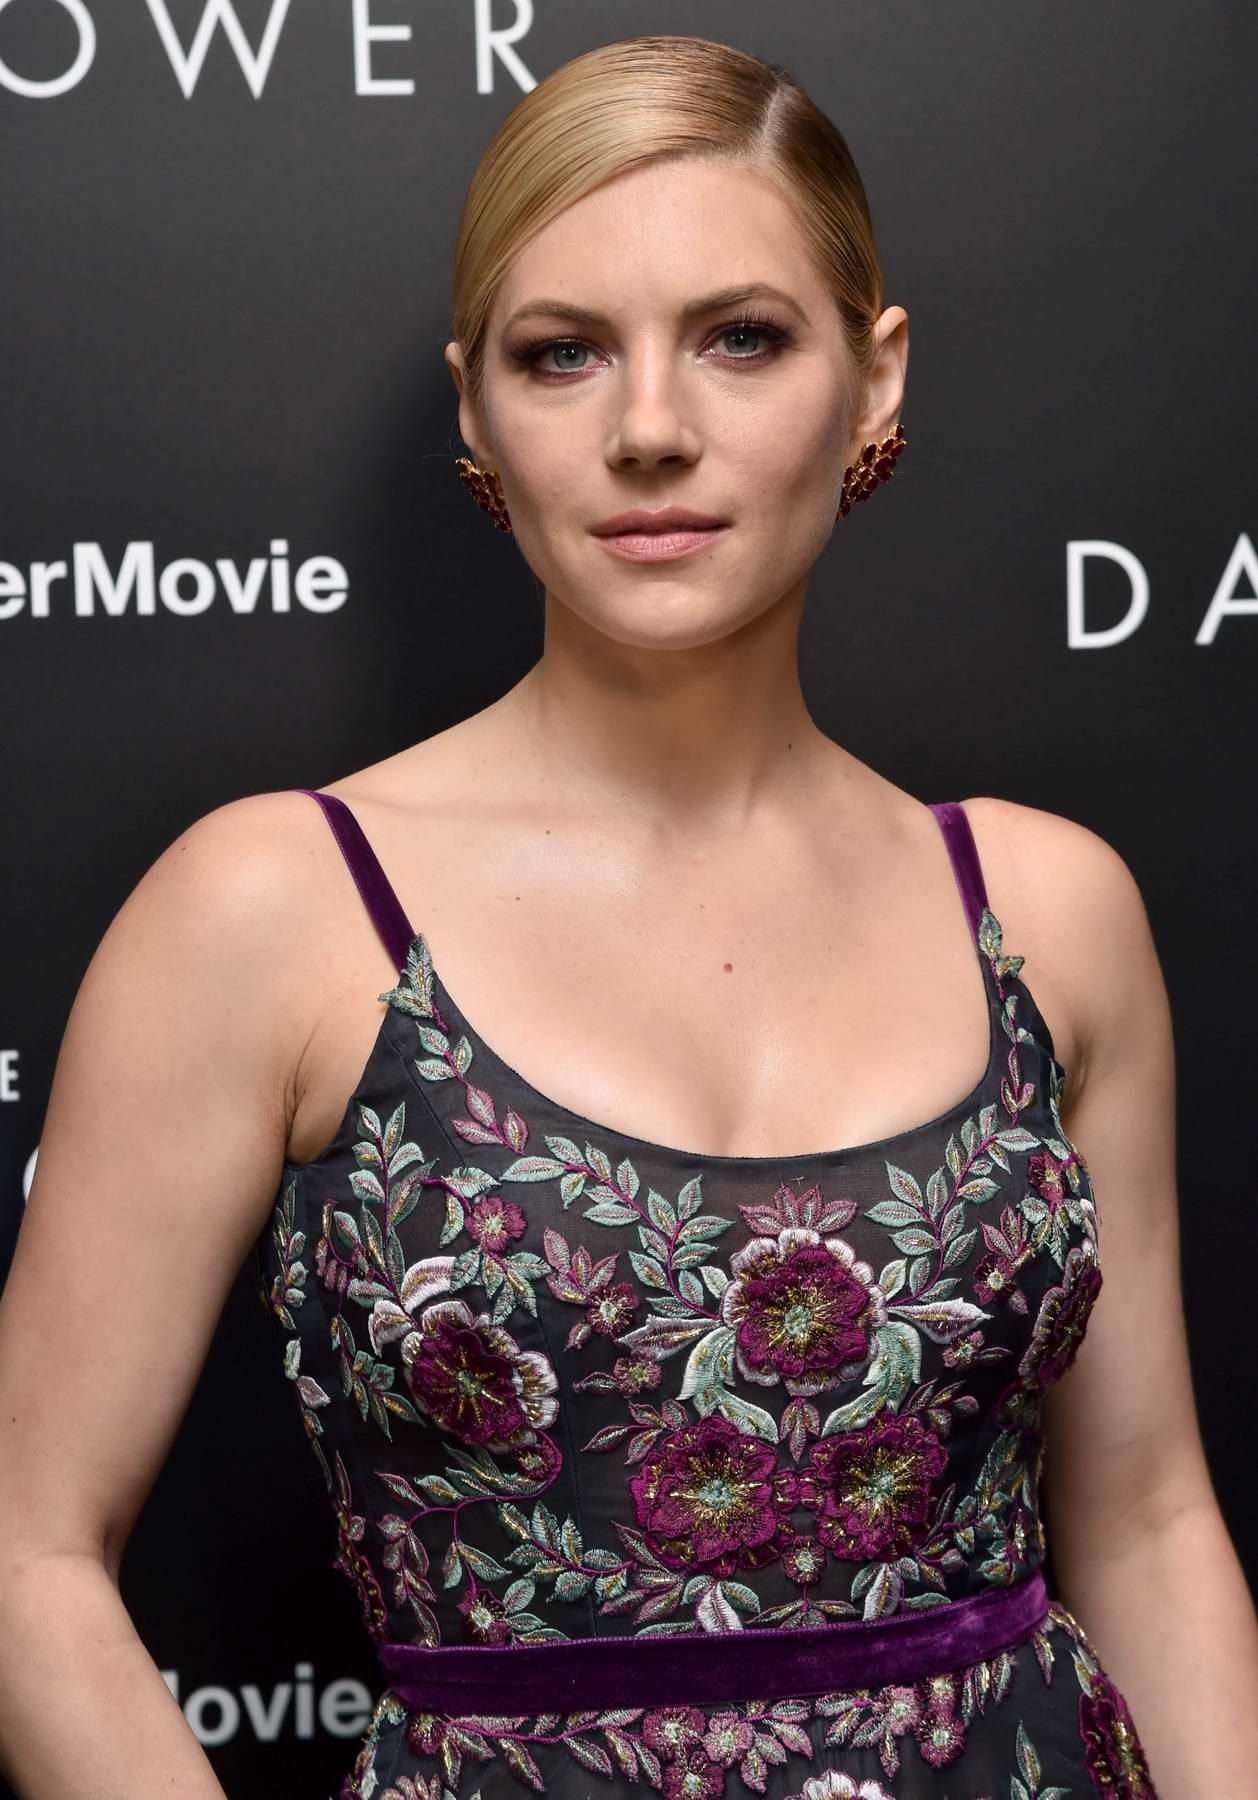 Katheryn Winnick attends The Dark Tower premiere in New York